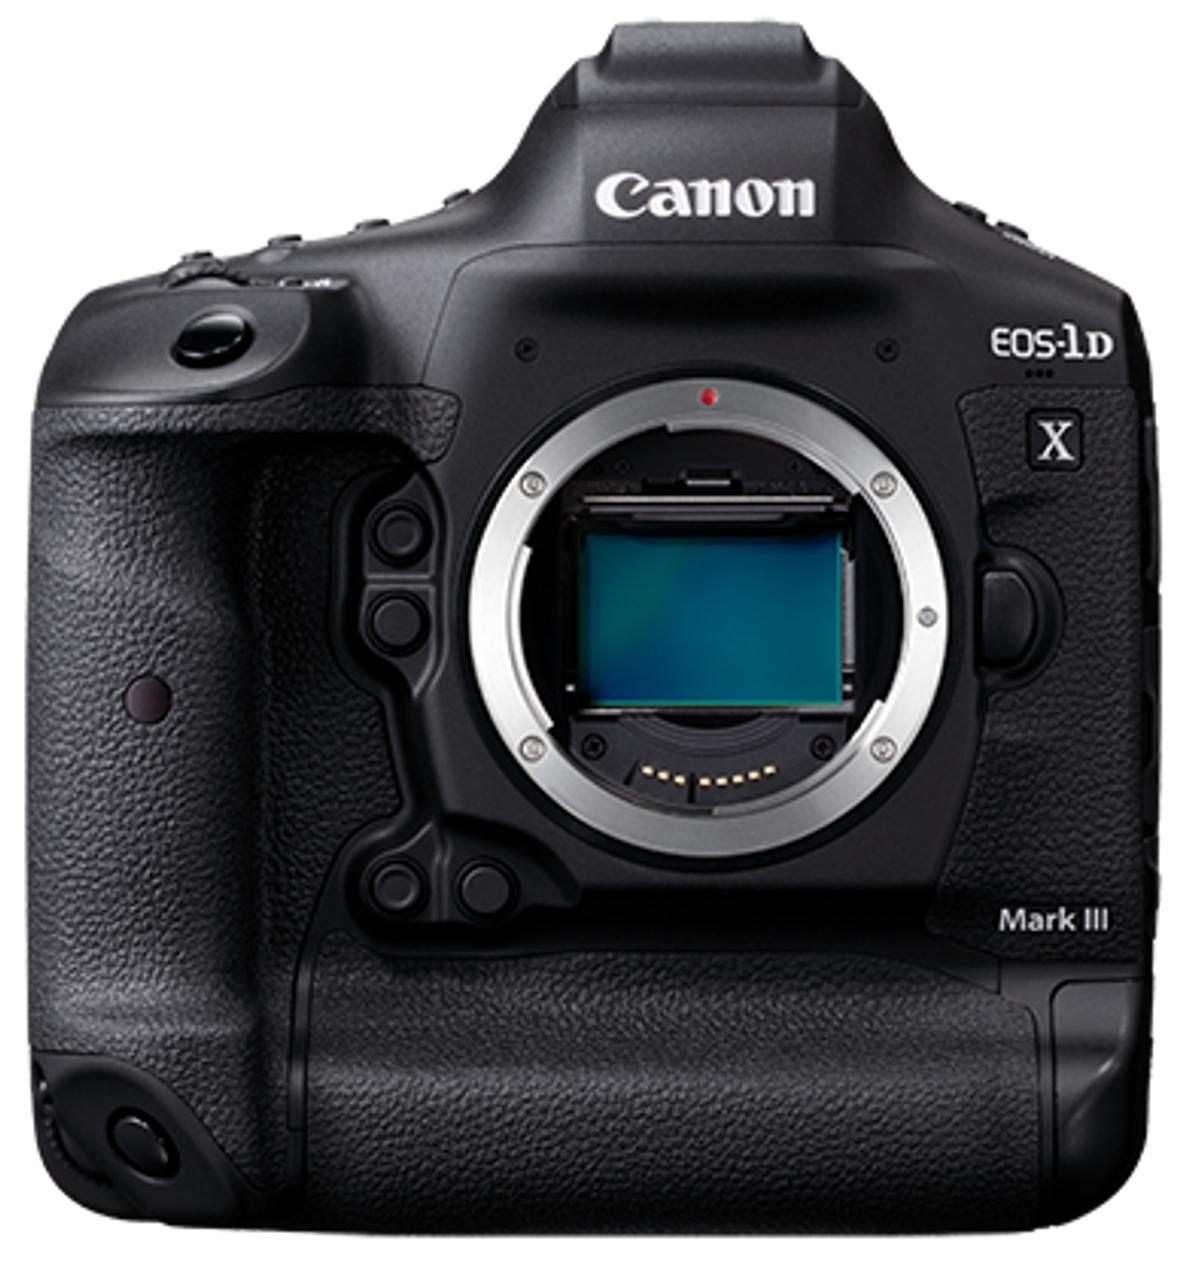 Canon EOS-1D X Mark III - Body Only - Black